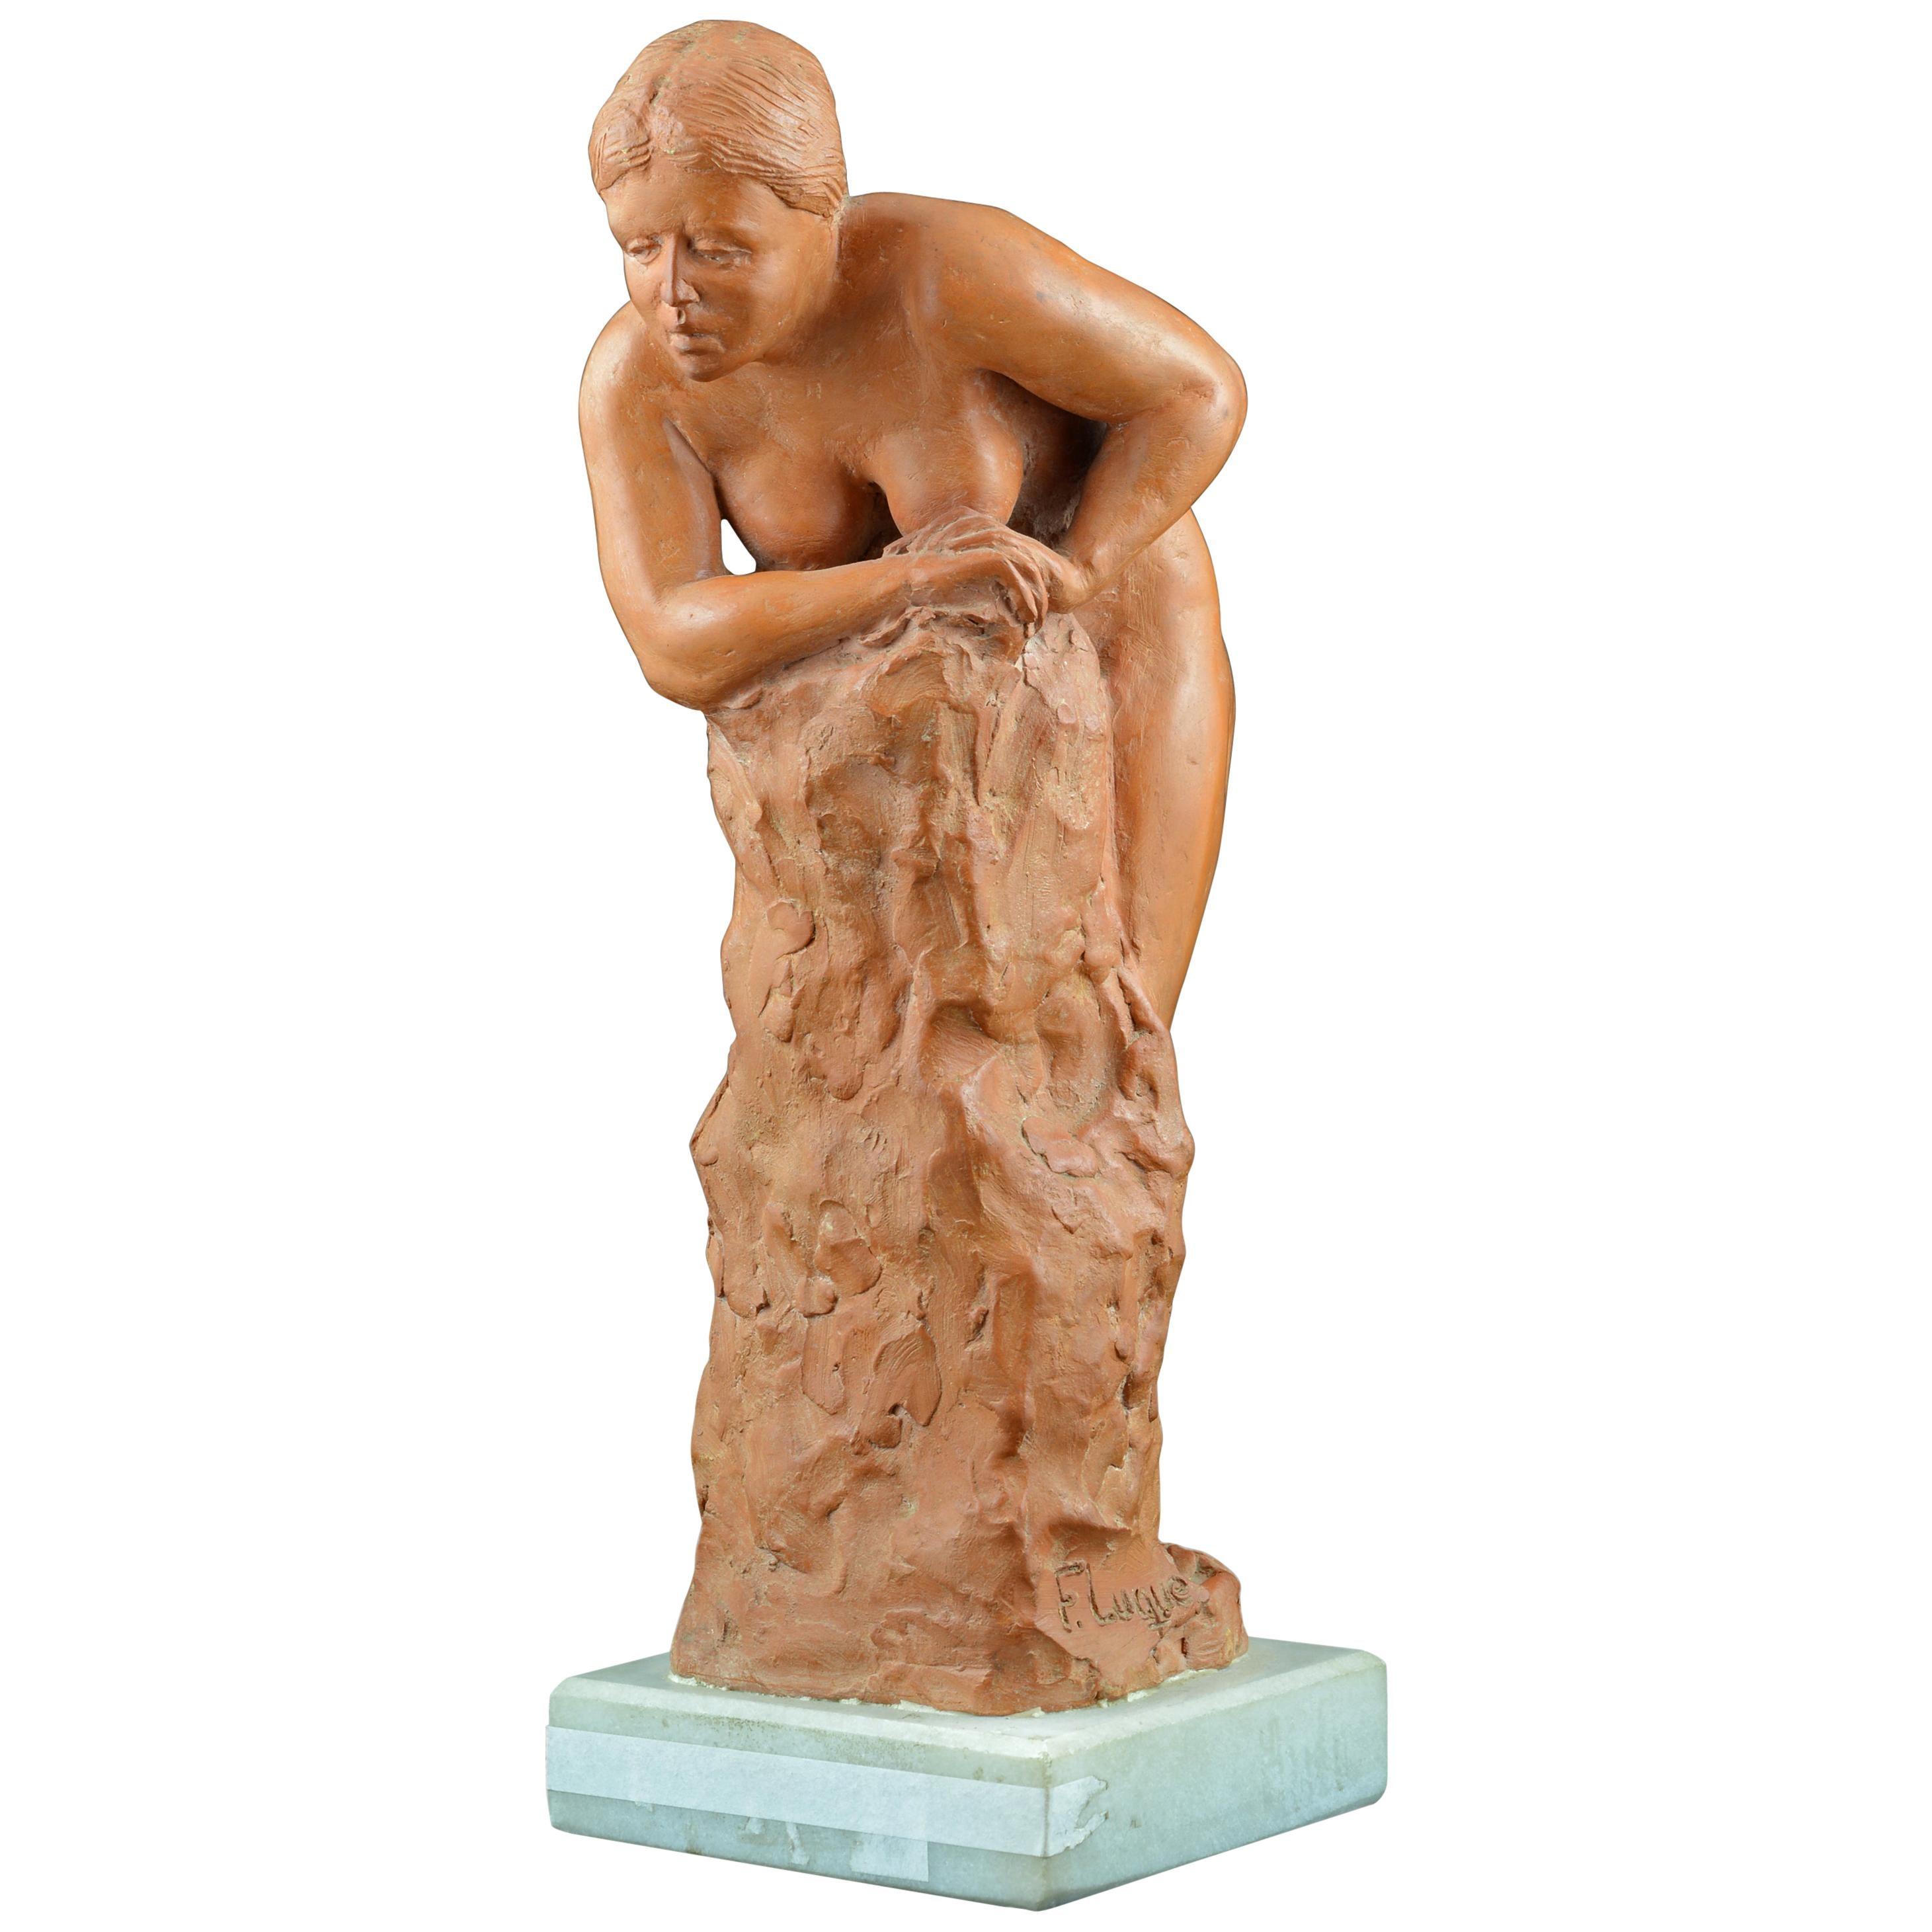 Terracotta Sculpture Signed Francisco Luque, Spain, 20th Century